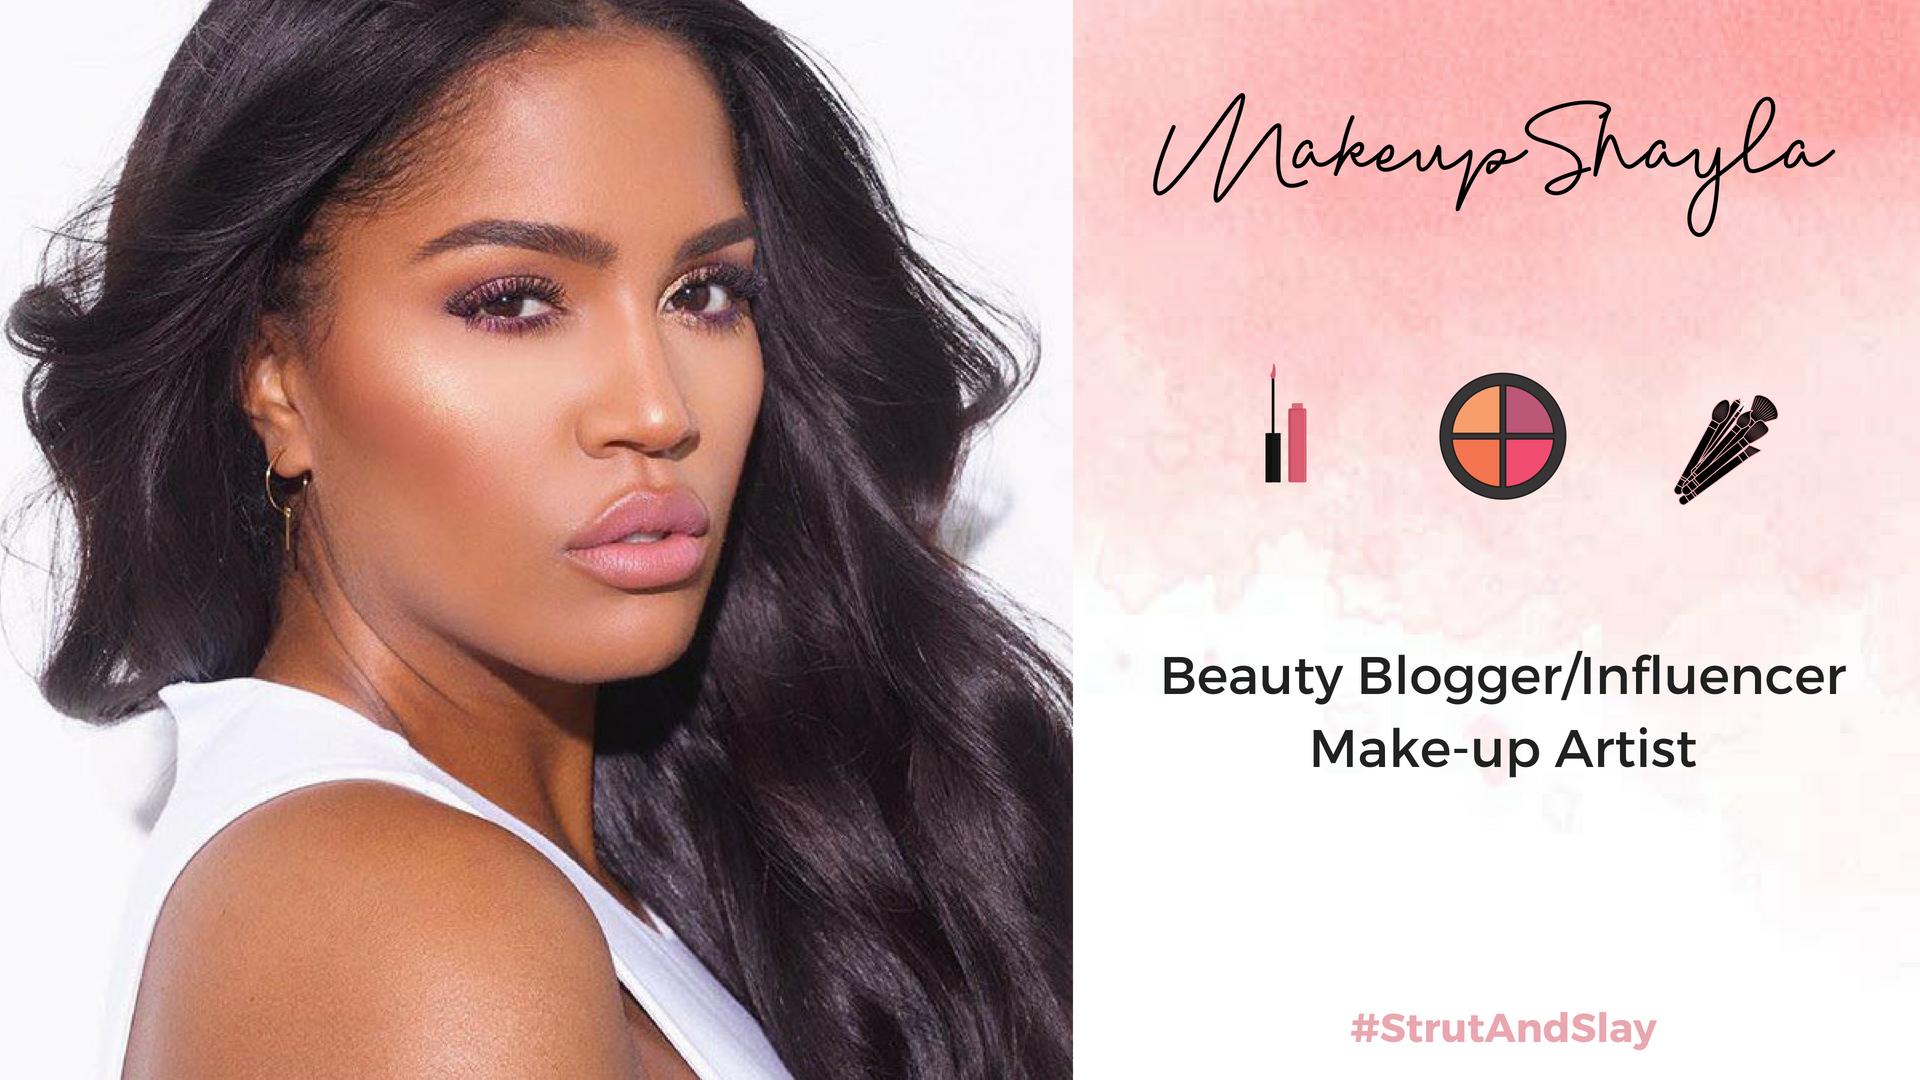 MakeupShayla Media Kit